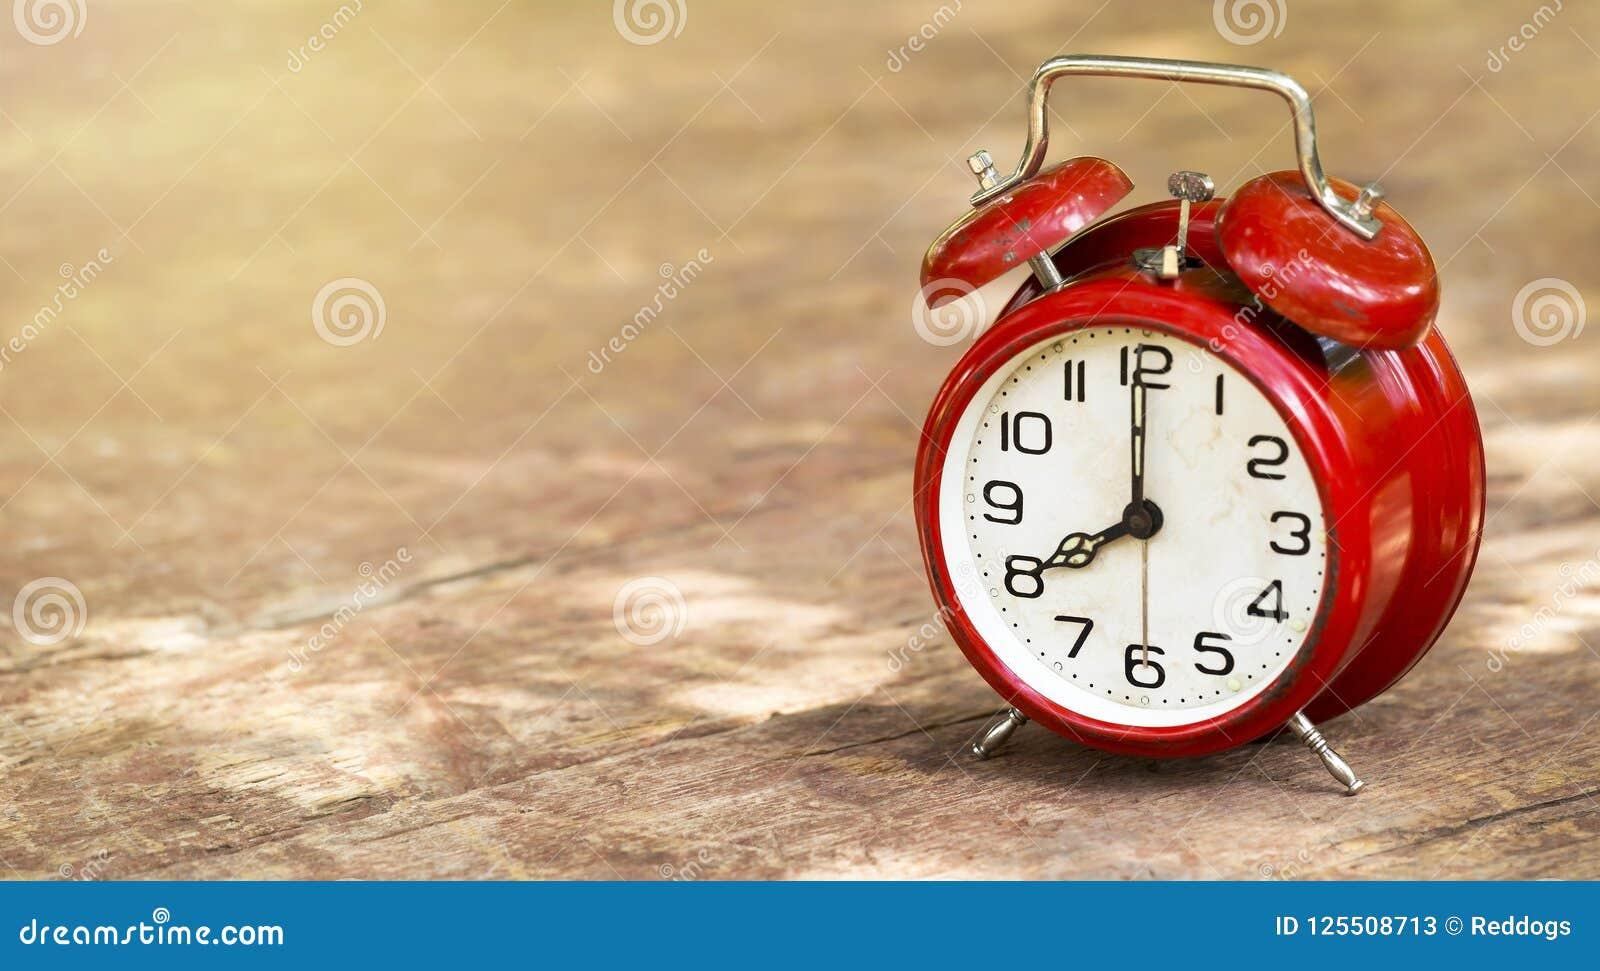 Daylight savings time - vintage red alarm clock banner